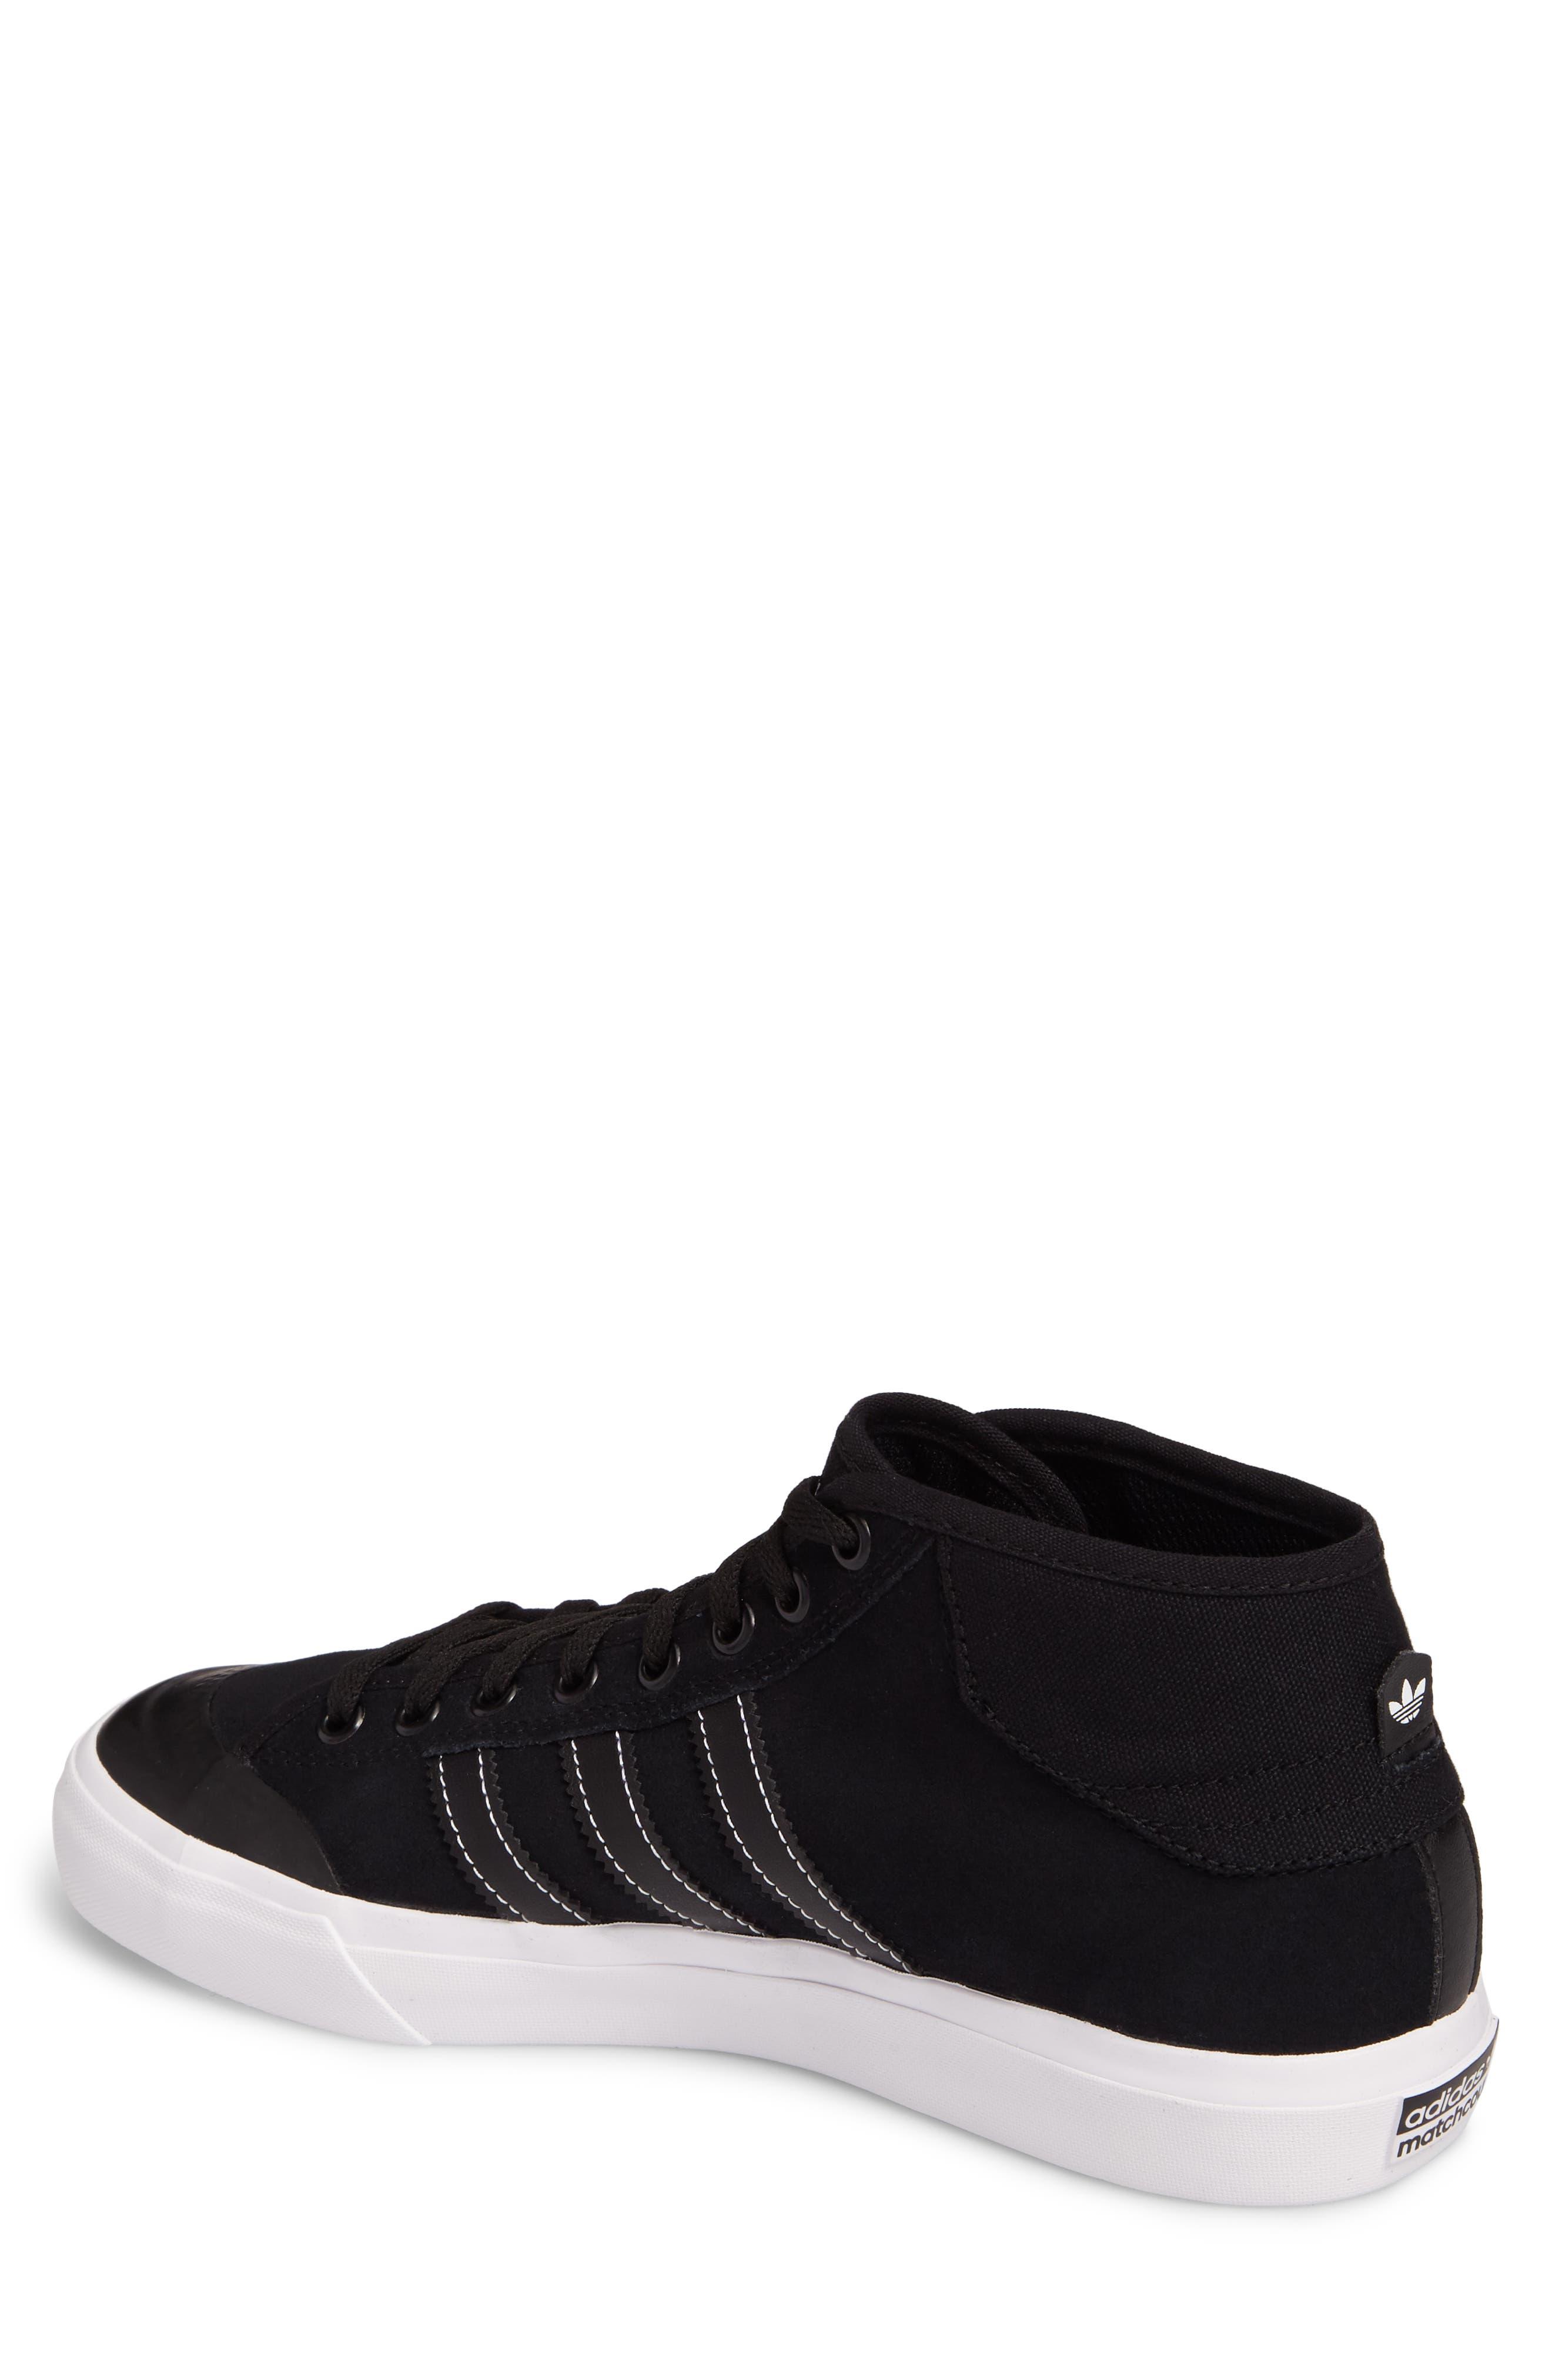 Alternate Image 2  - adidas Matchcourt Mid ADV Sneaker (Men)